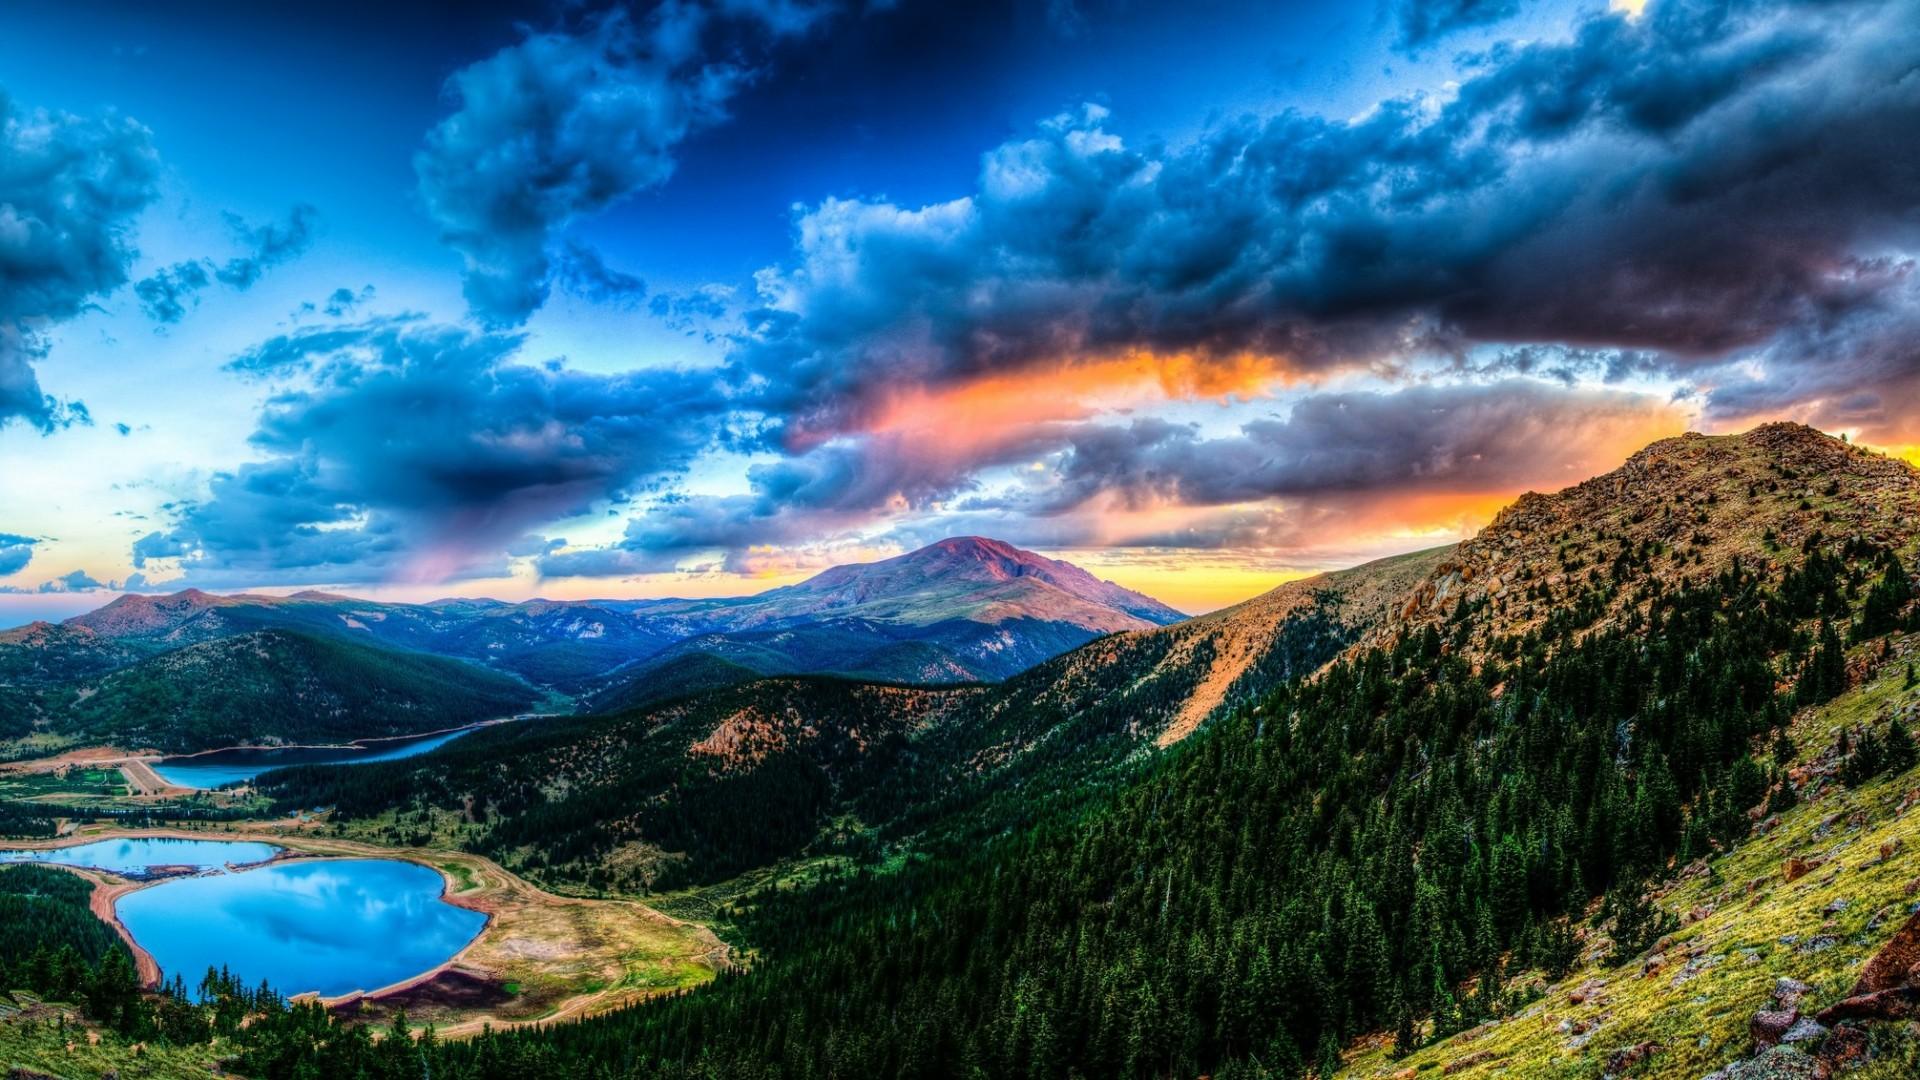 … Background Full HD 1080p. Wallpaper sunset, mountain, lake,  landscape